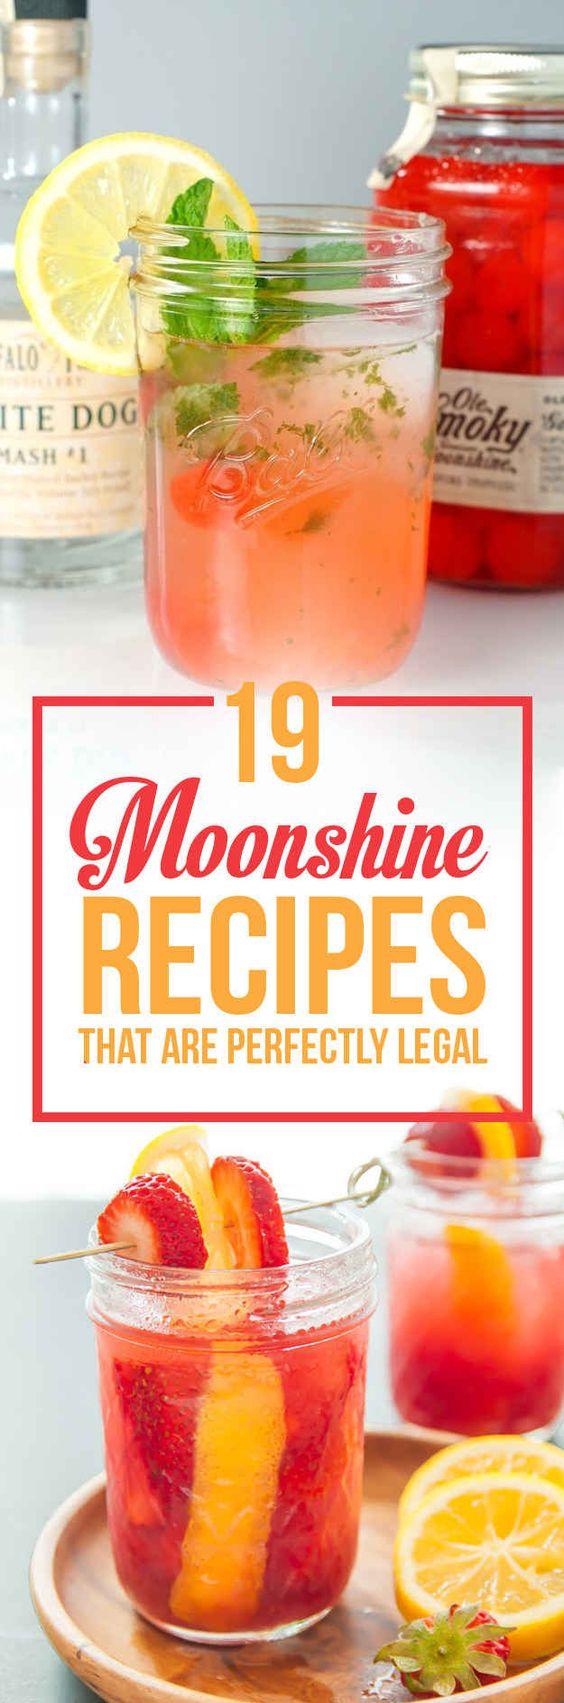 19 Receitas Moonshine perfeitamente legais